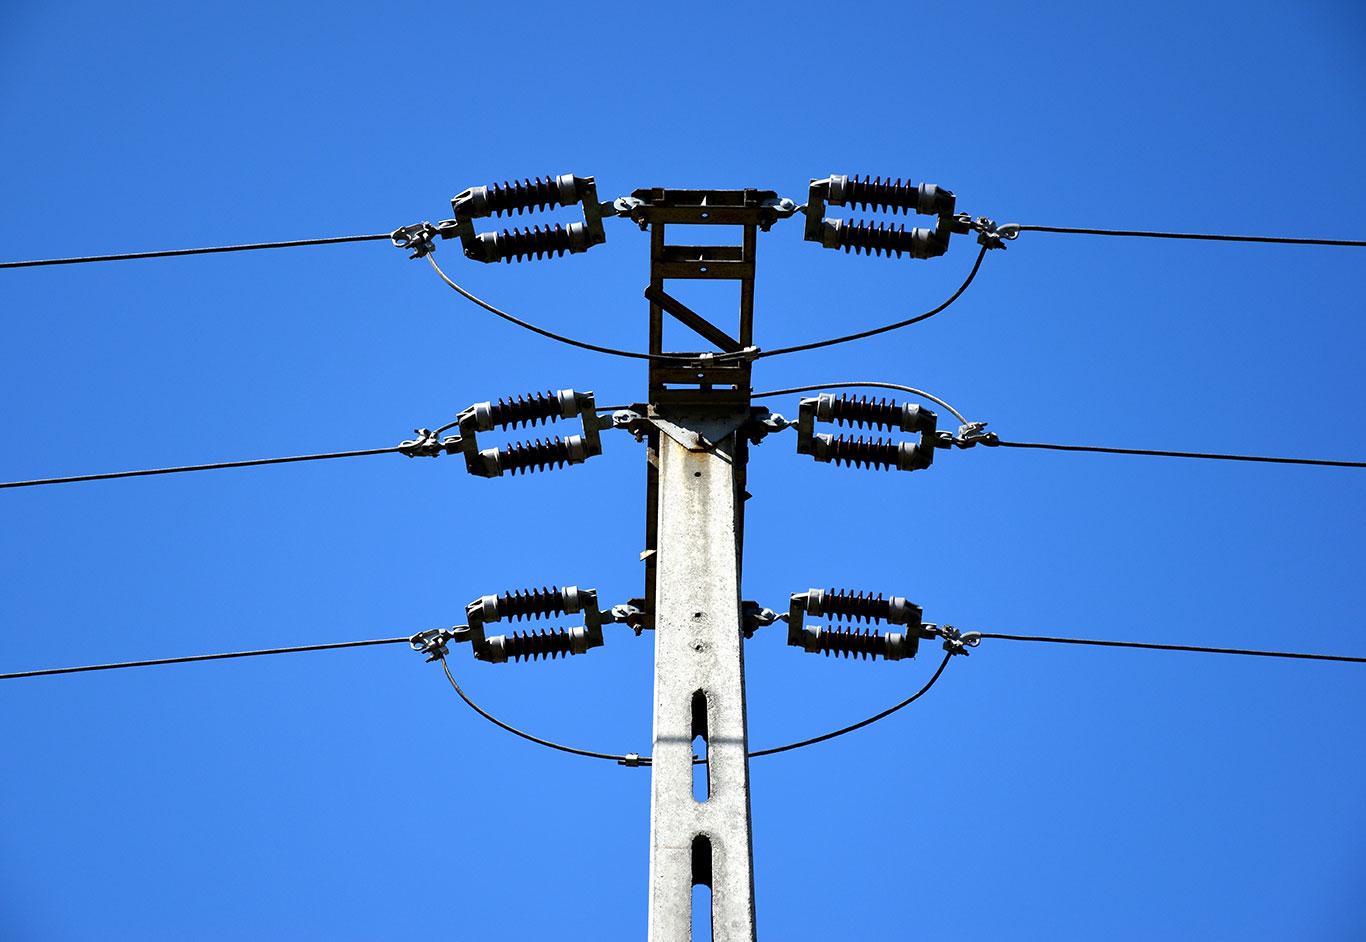 Sagging Power Lines